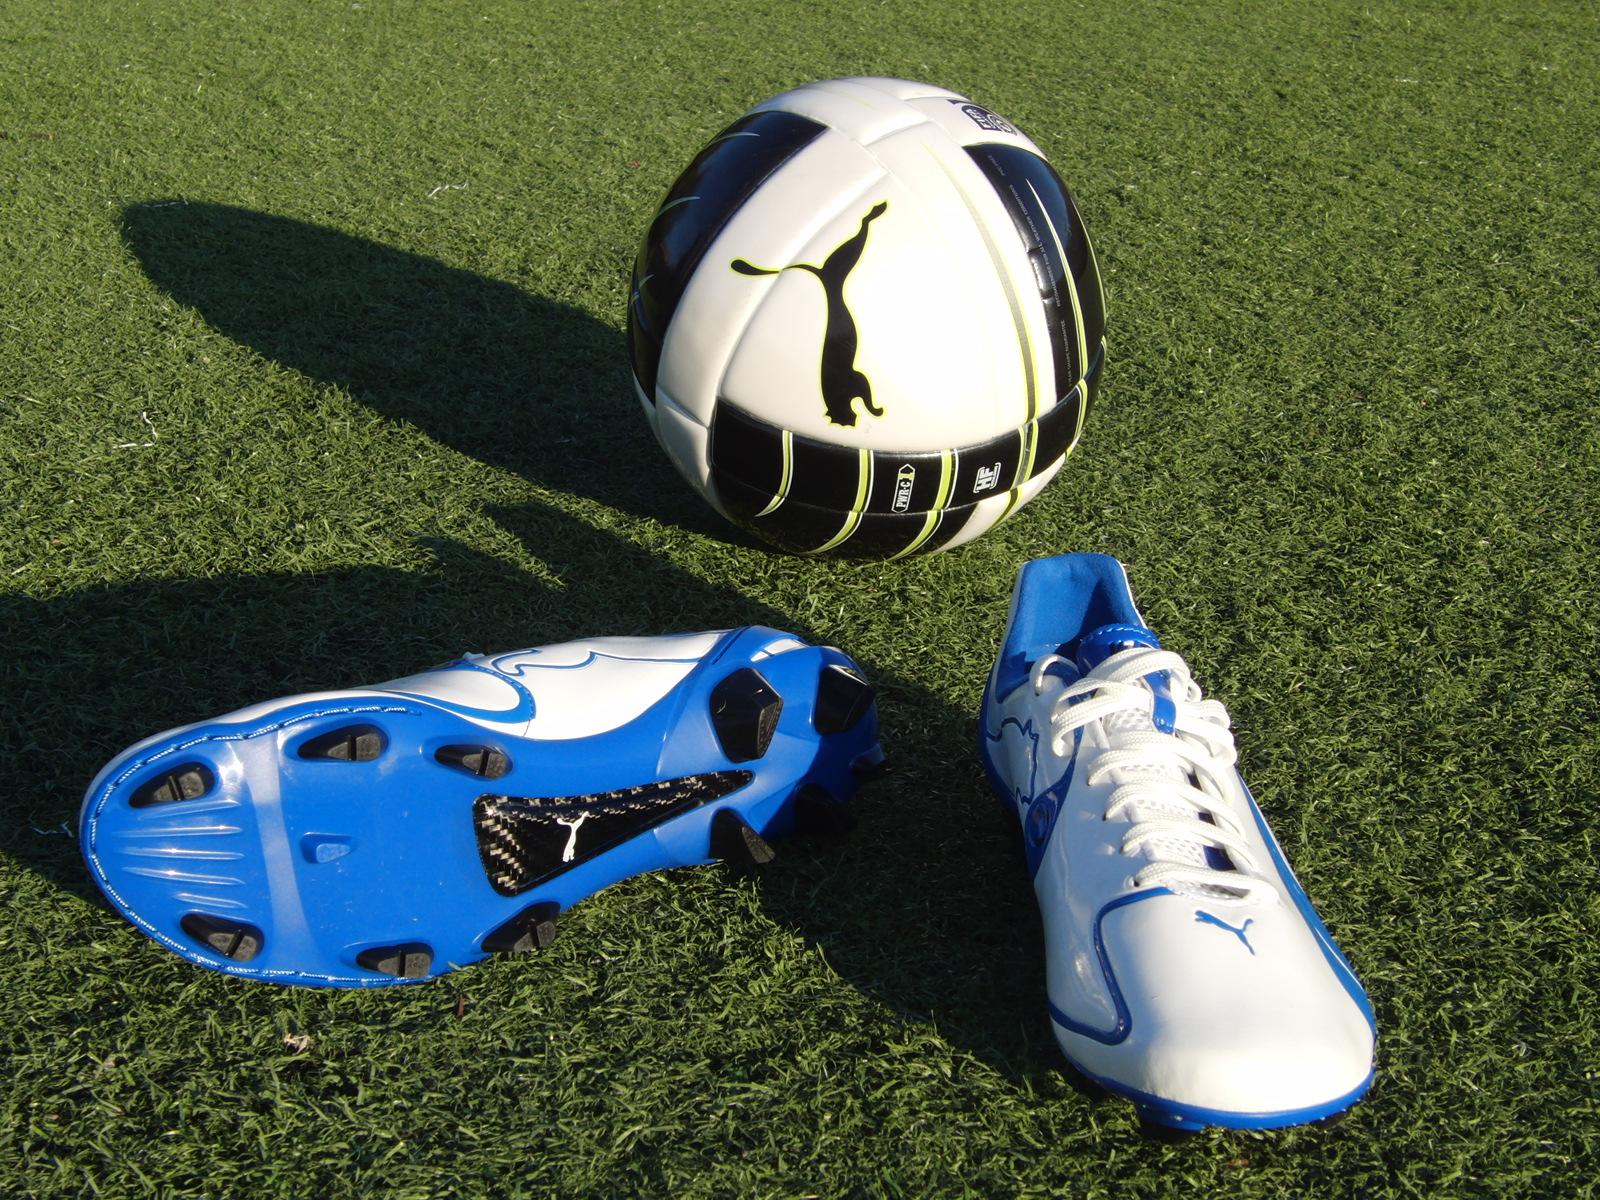 Puma V1.10 SL Review | Soccer Cleats 101